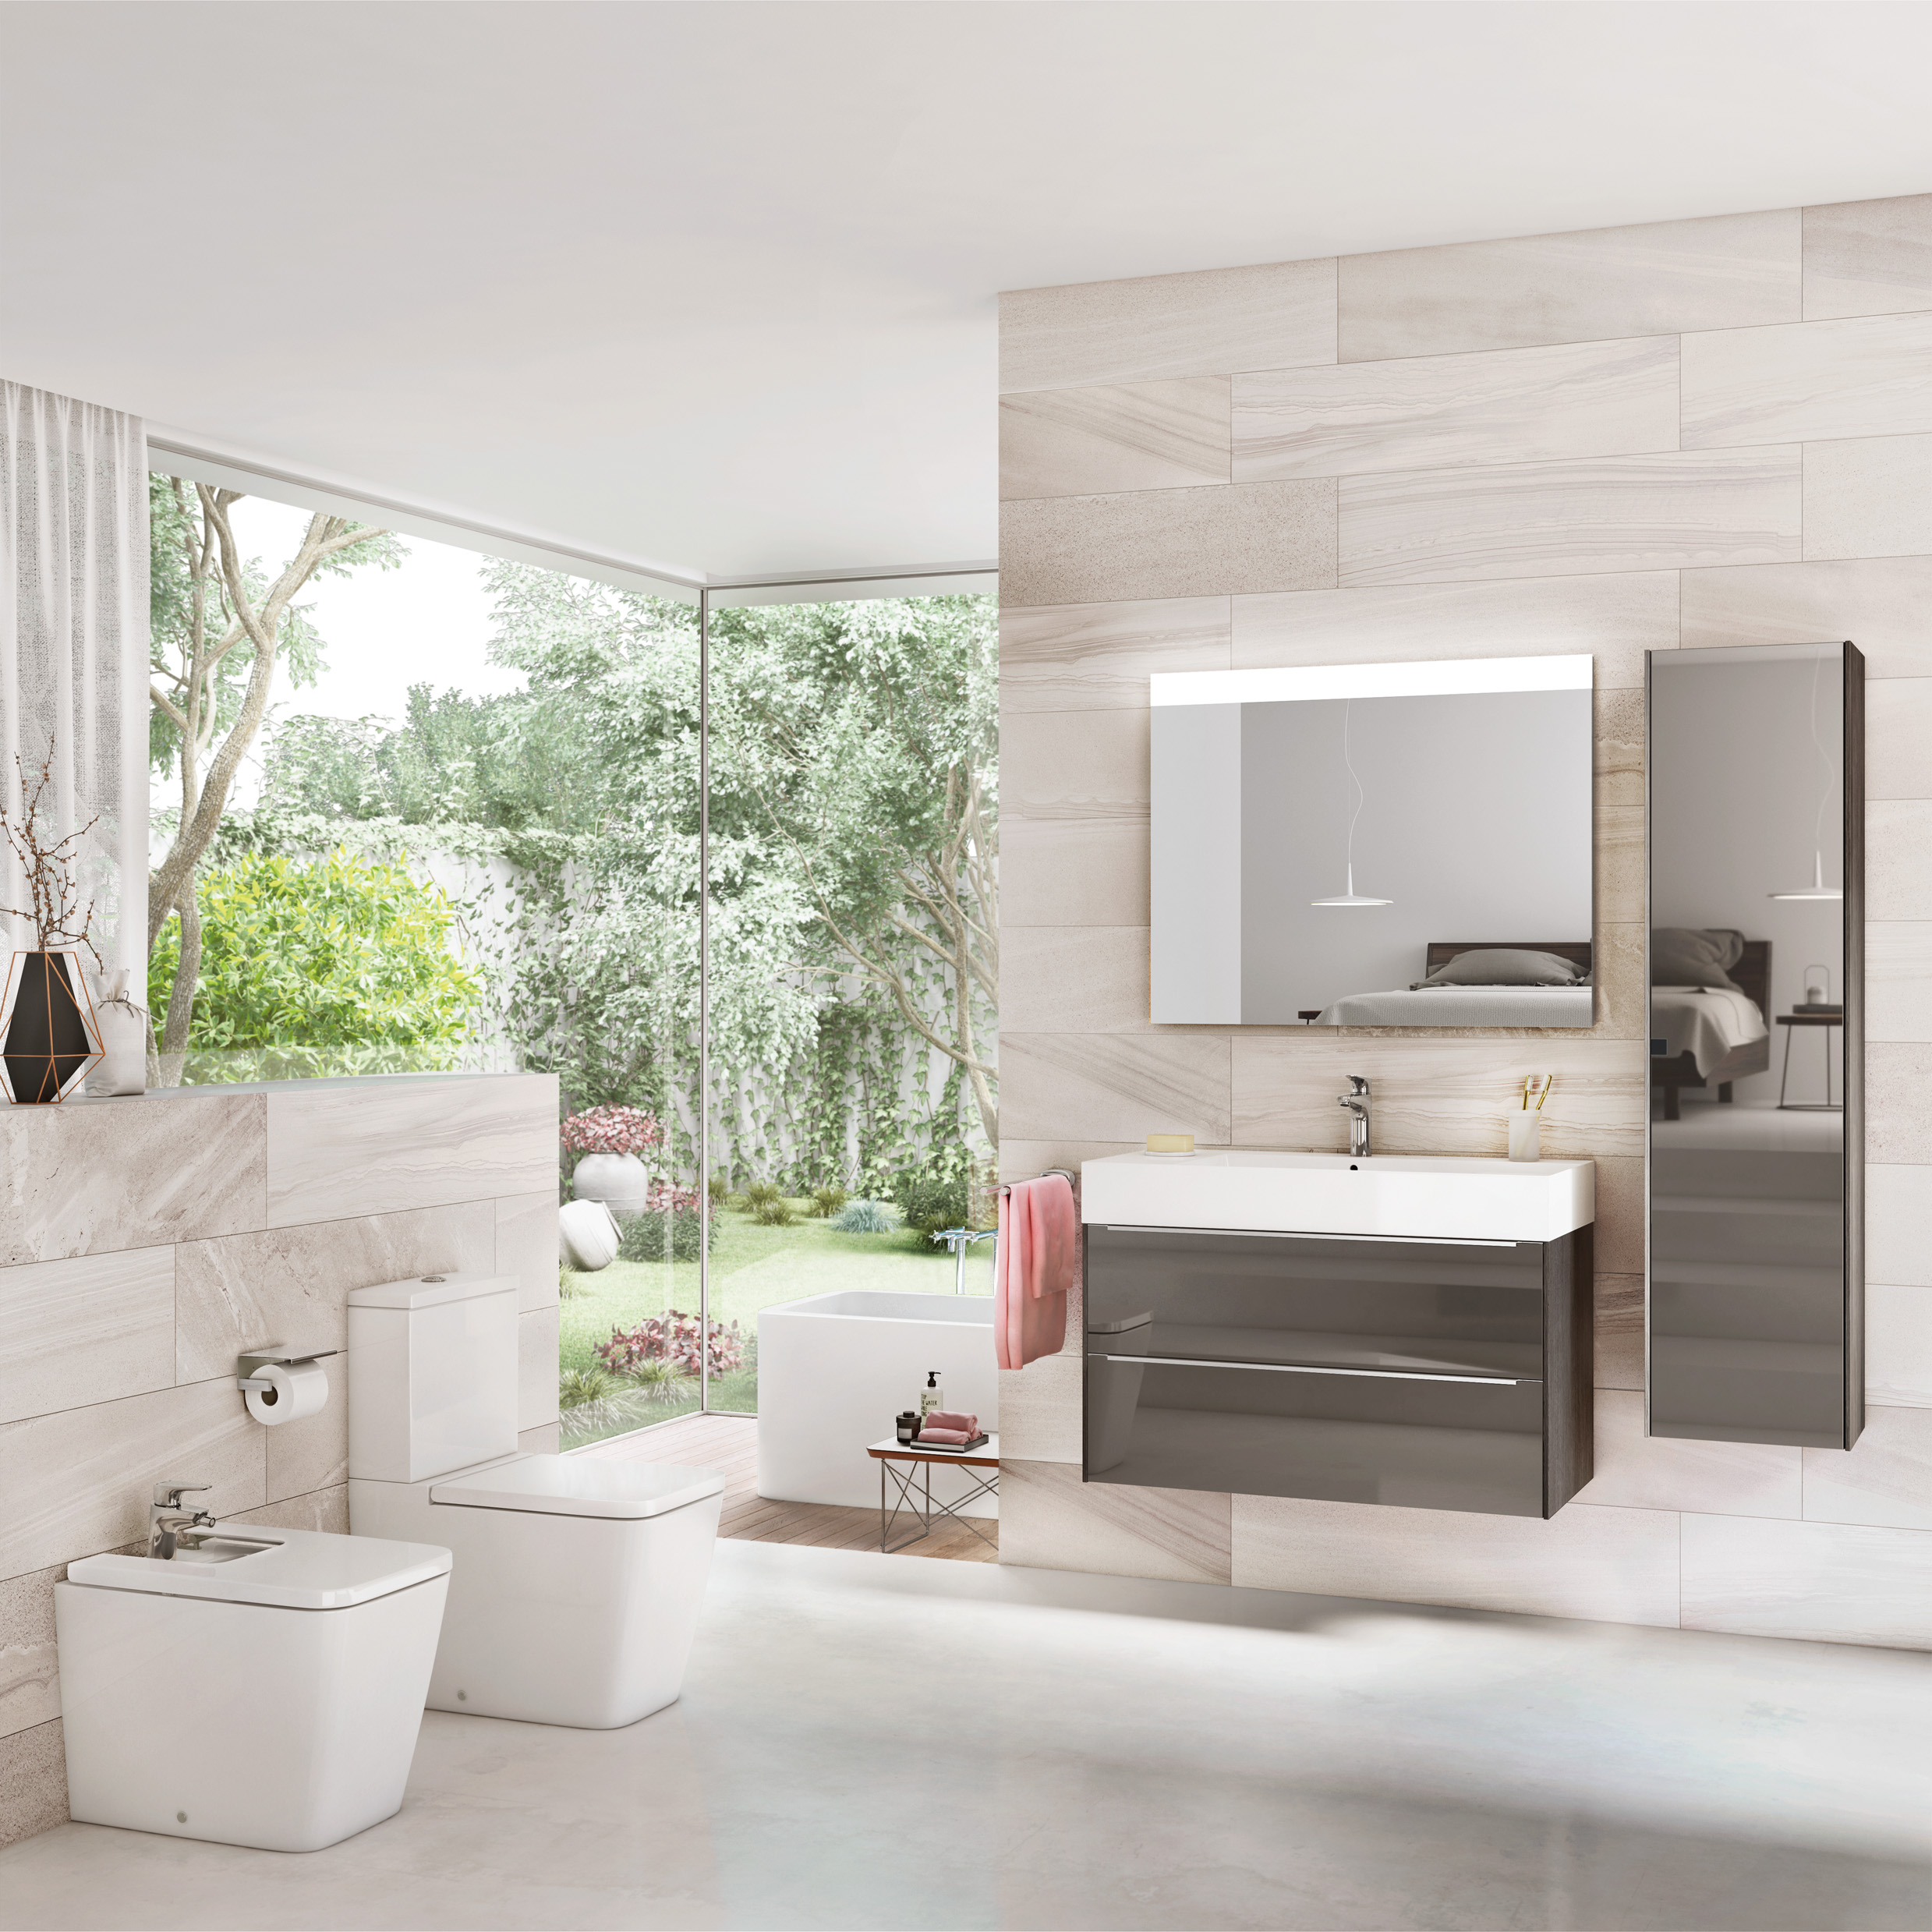 Inspira, designer bathroom & furniture collection | Roca Life